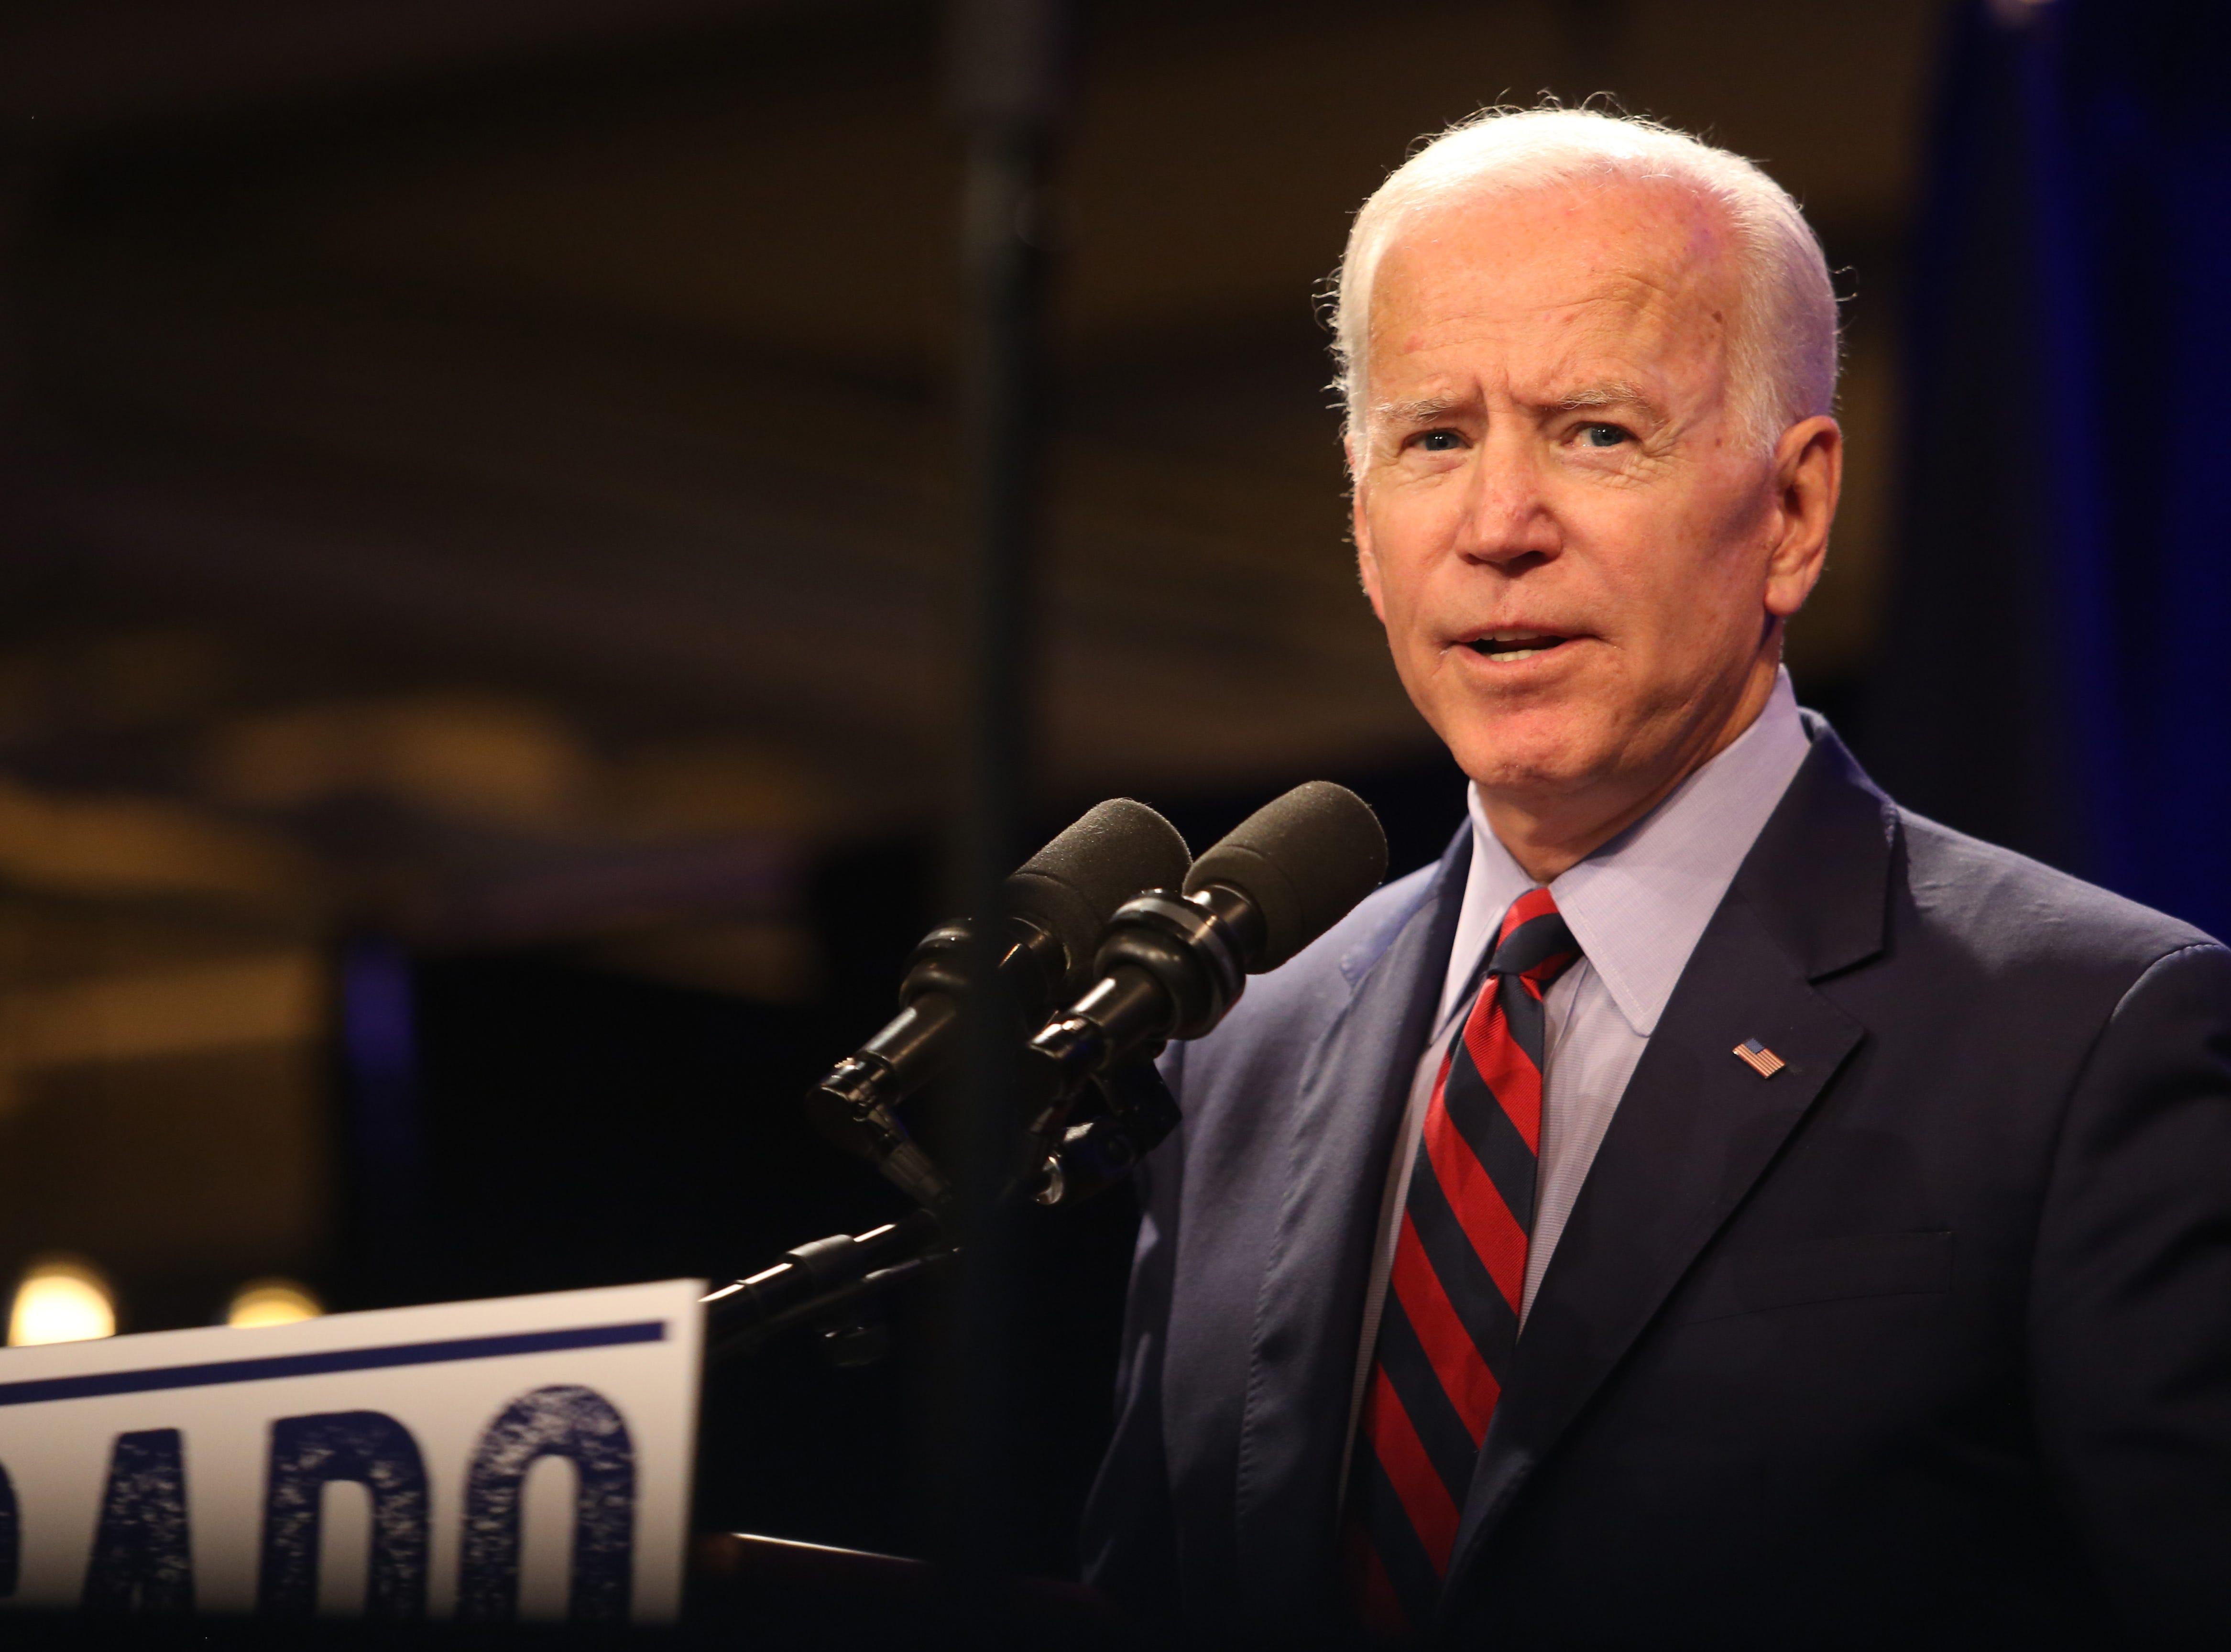 Former Vice President Joe Biden speaks during the Antonio Delgado rally in Kingston on October 26, 2018.